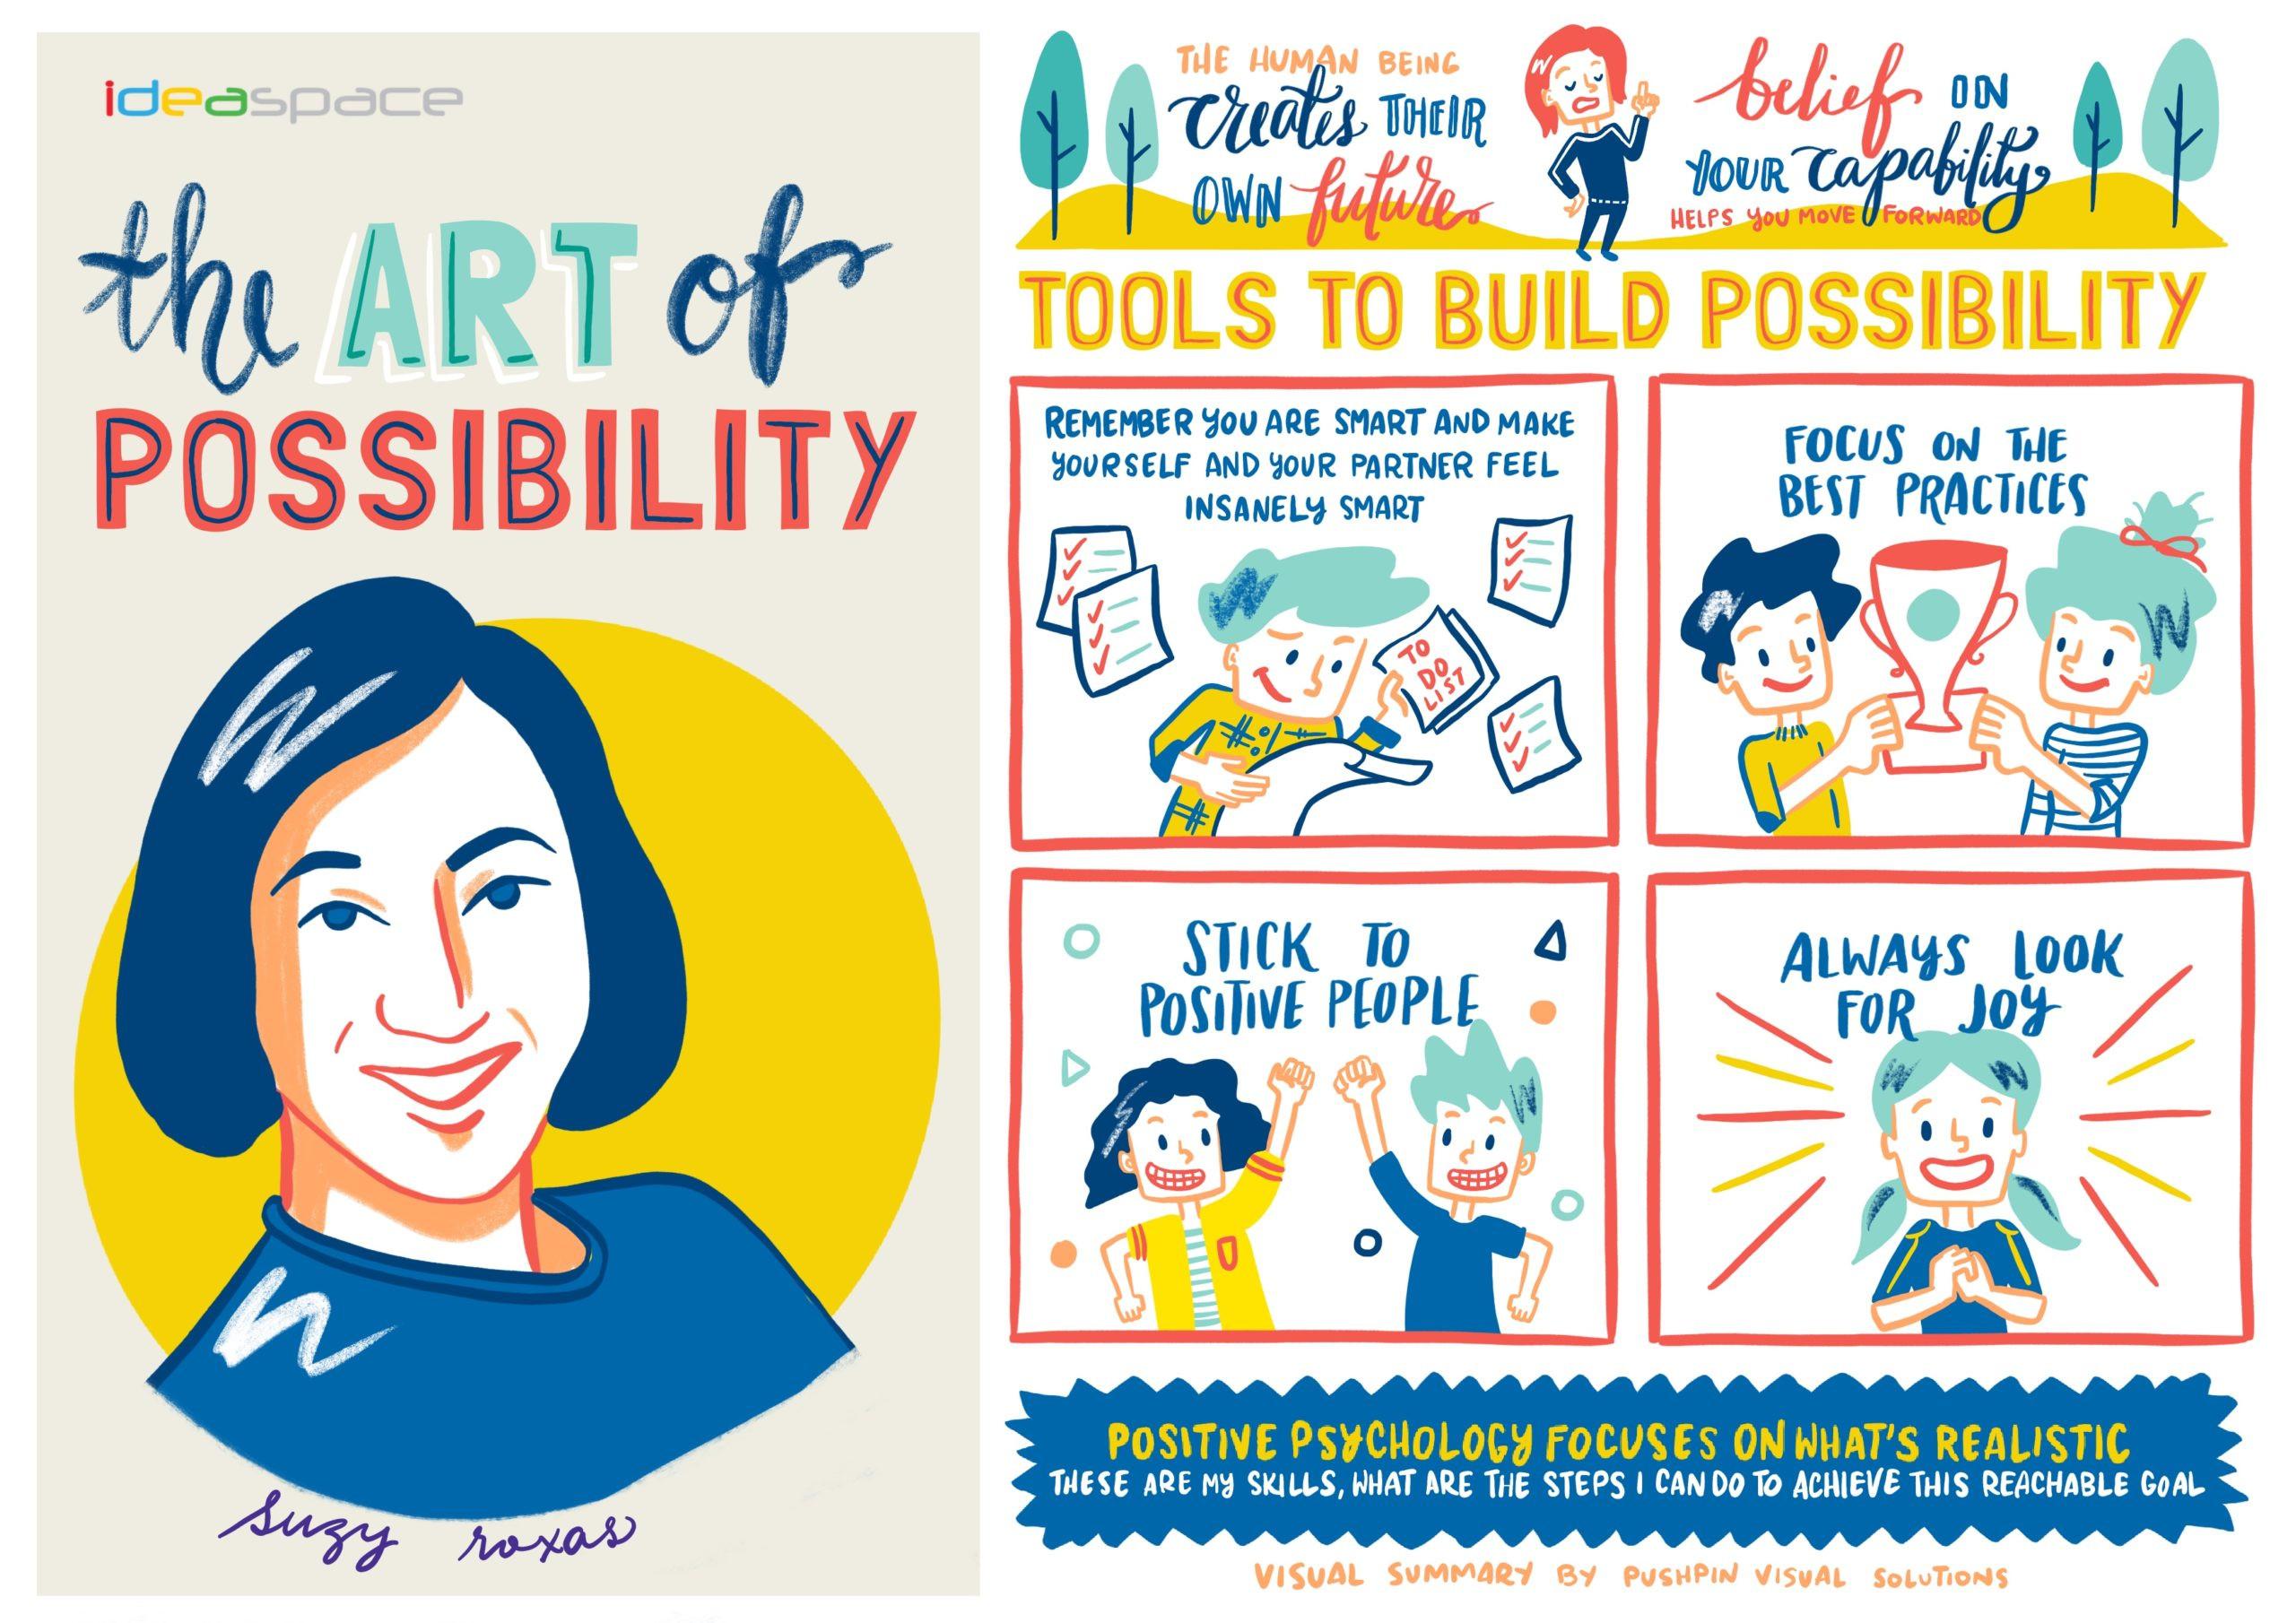 art-of-possibility